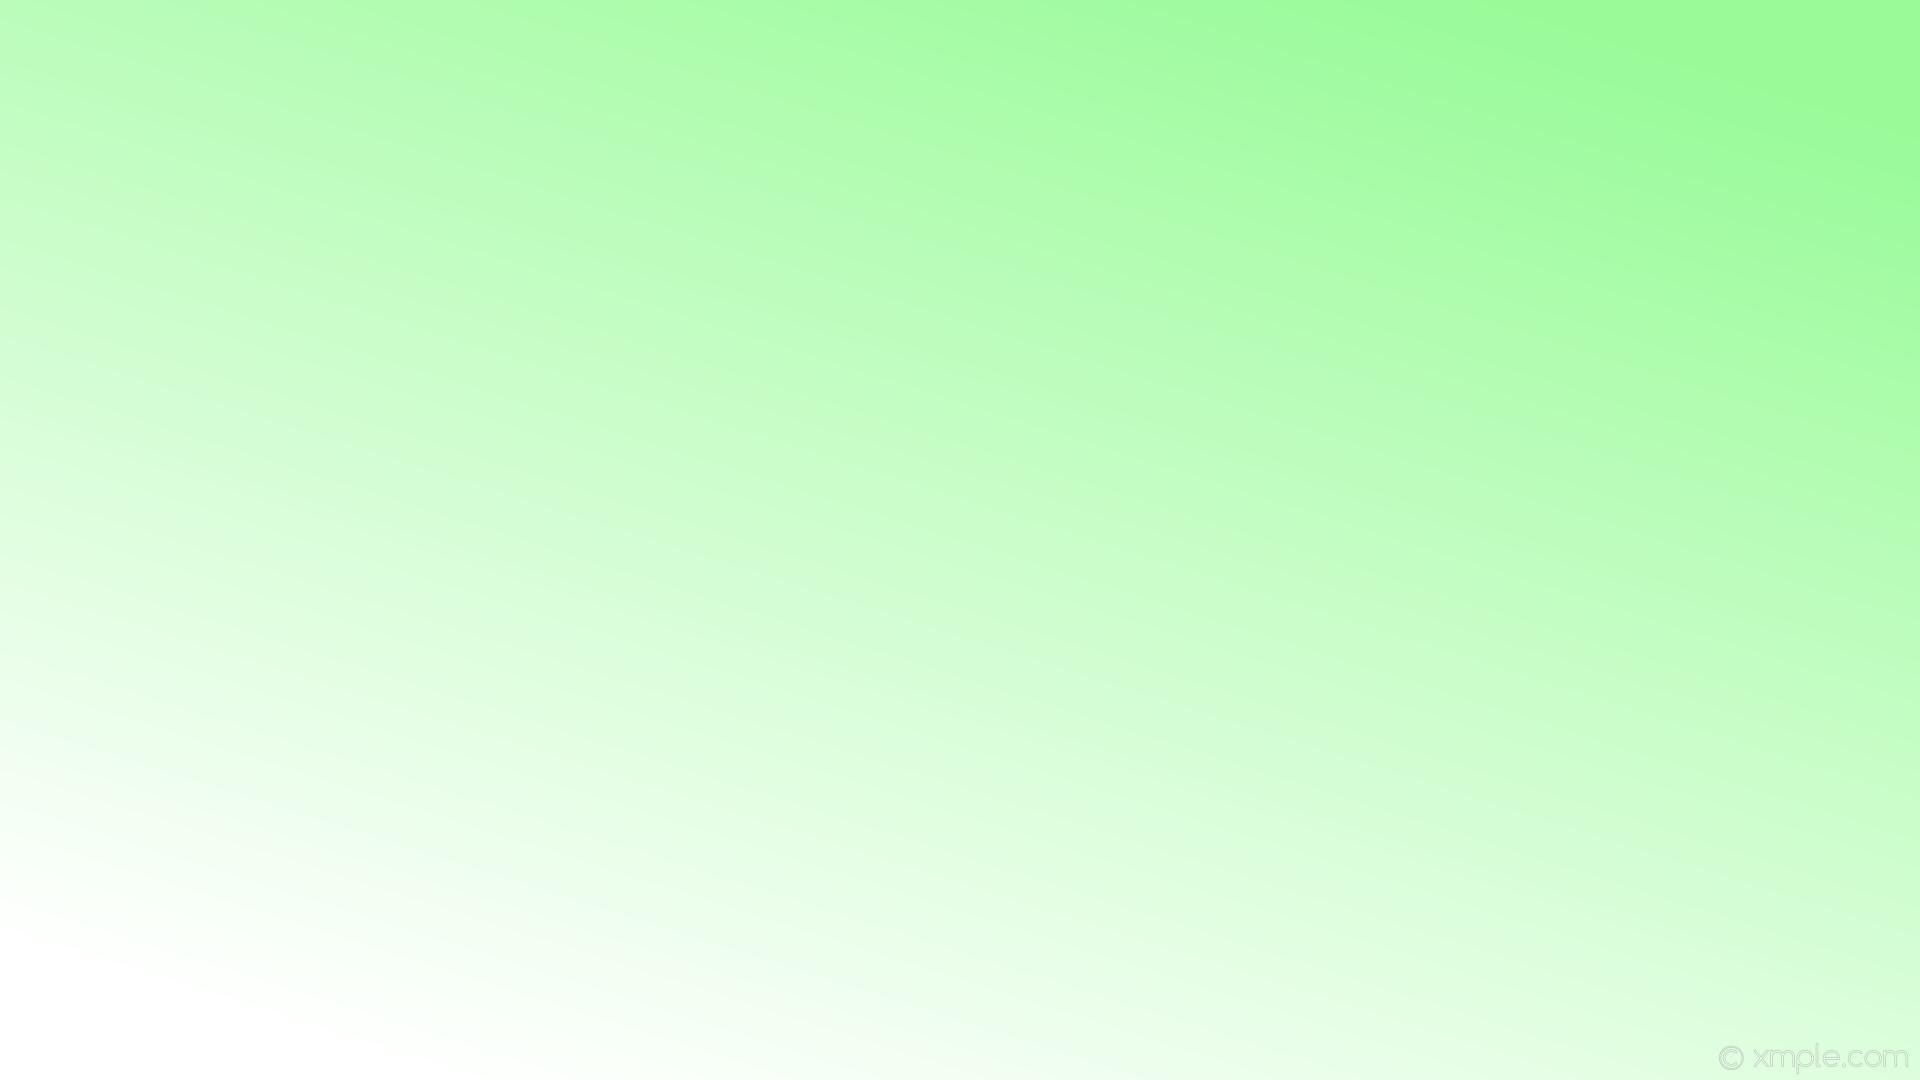 wallpaper linear green gradient white pale green #98fb98 #ffffff 45°